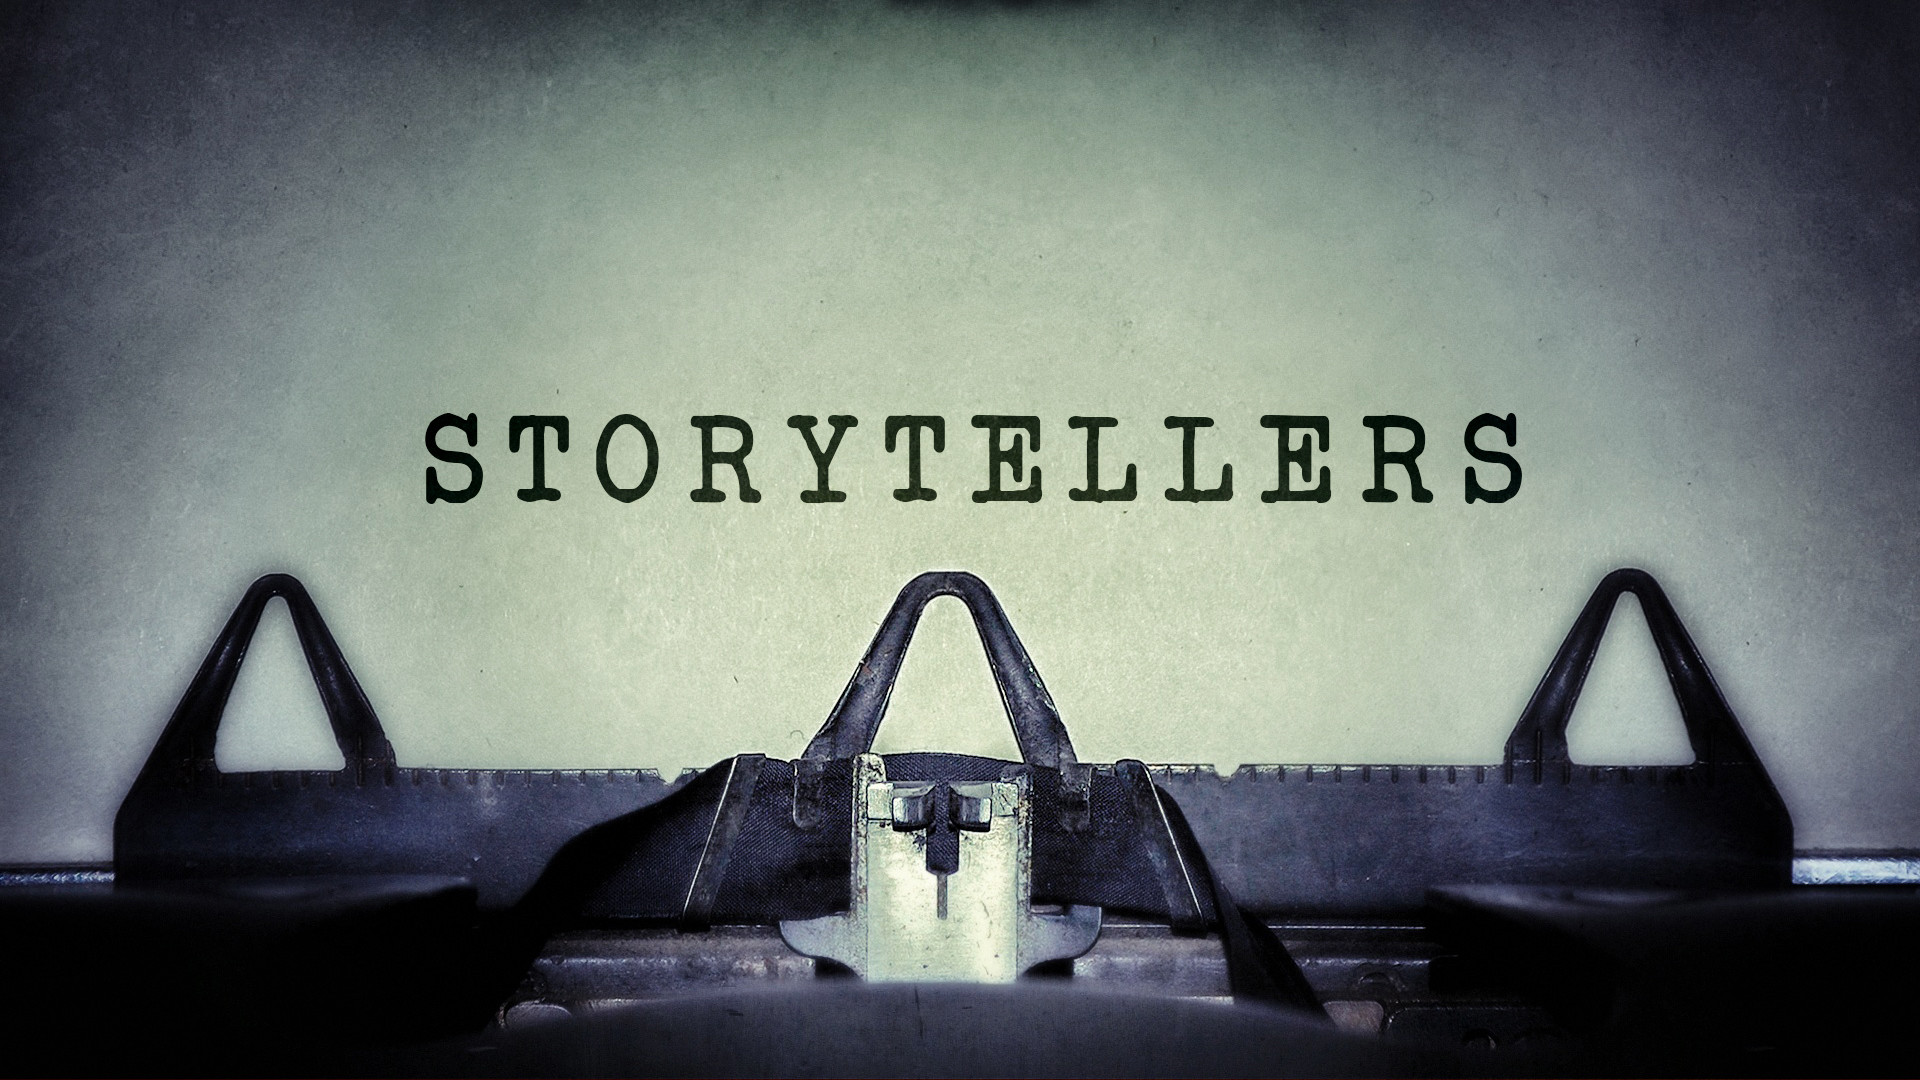 STORYTELLERS – A film has three directors